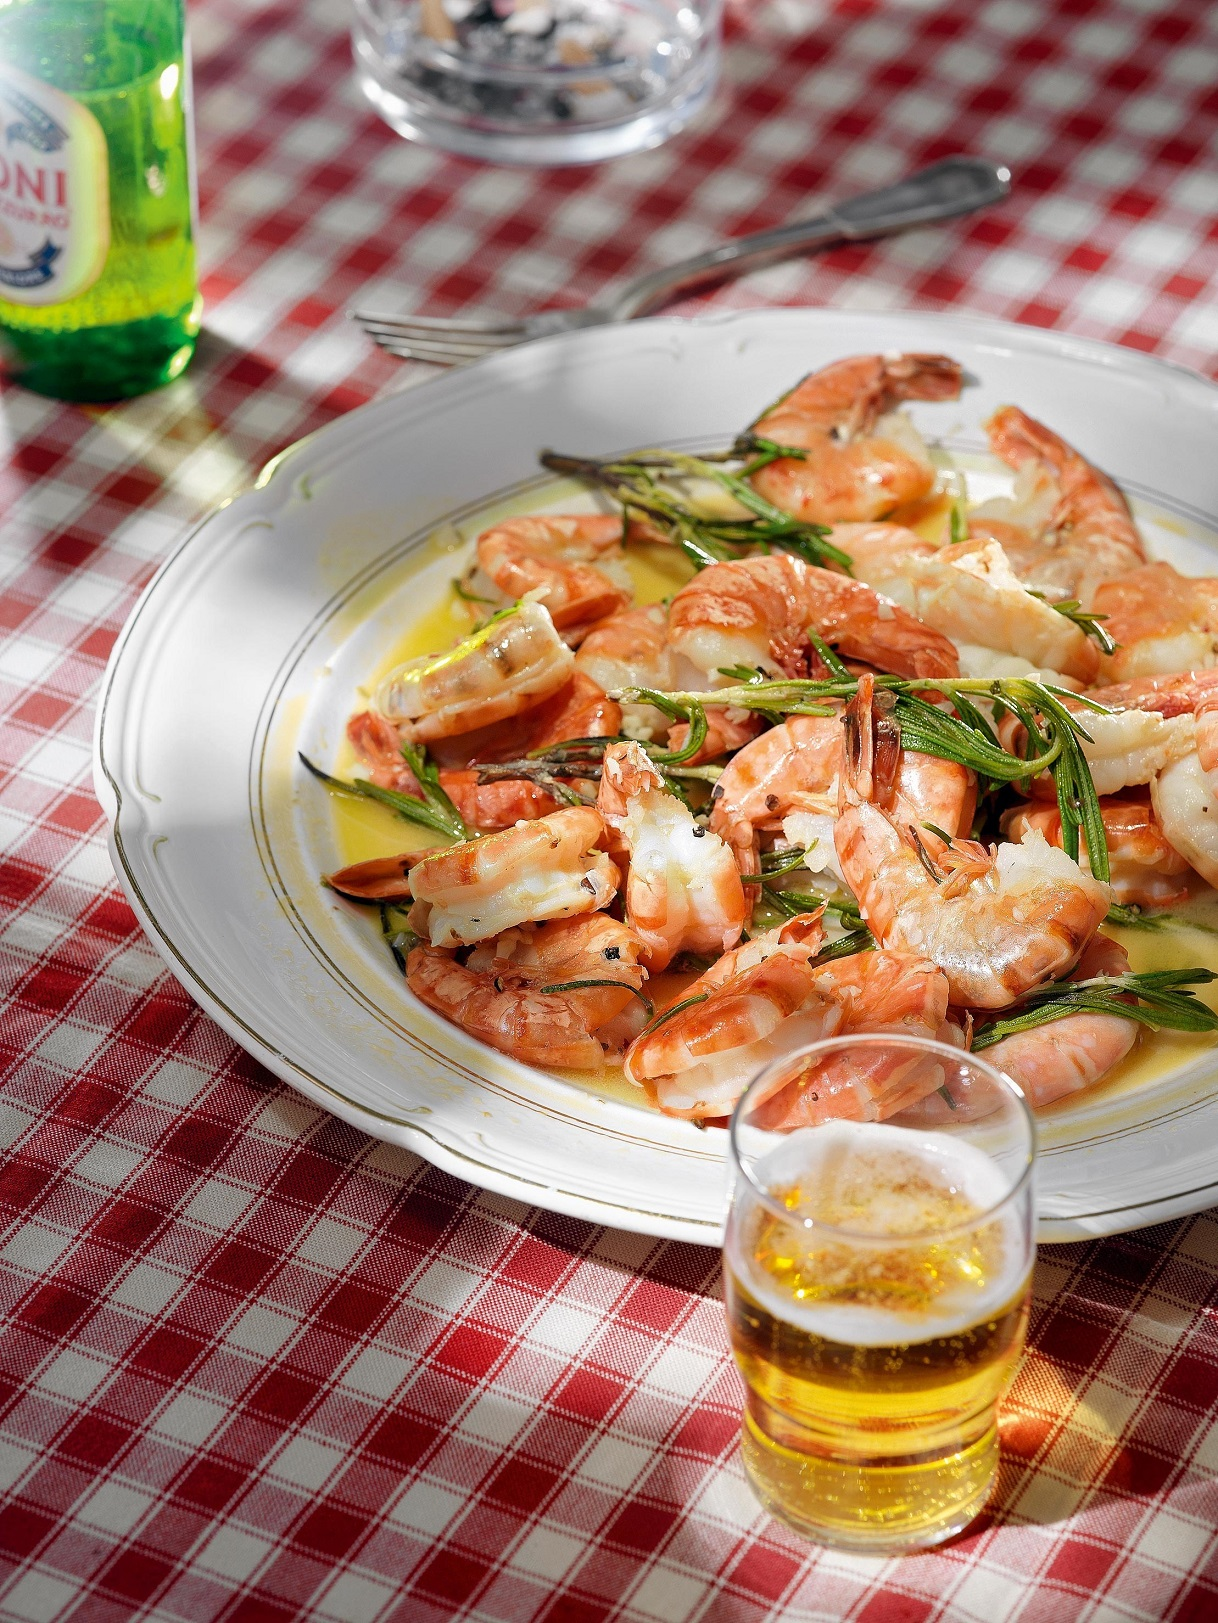 Shrimps in rosemary